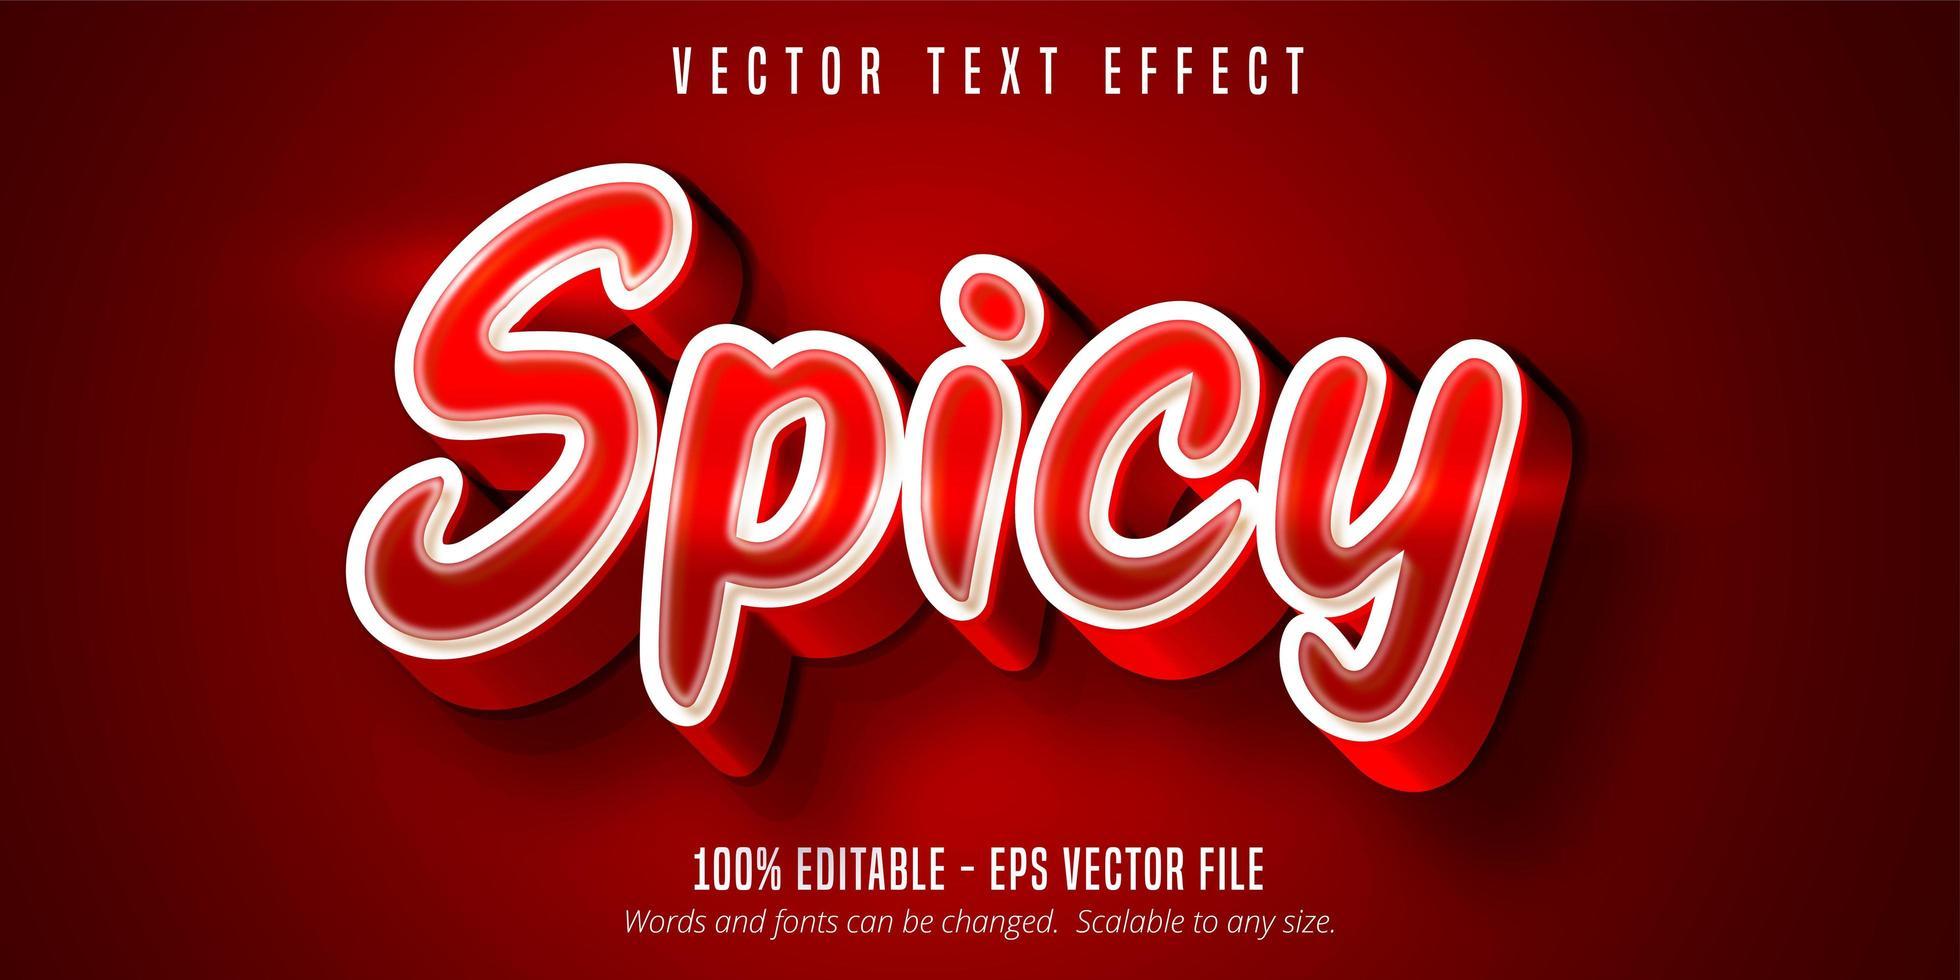 texto picante, efecto de texto de color rojo vector